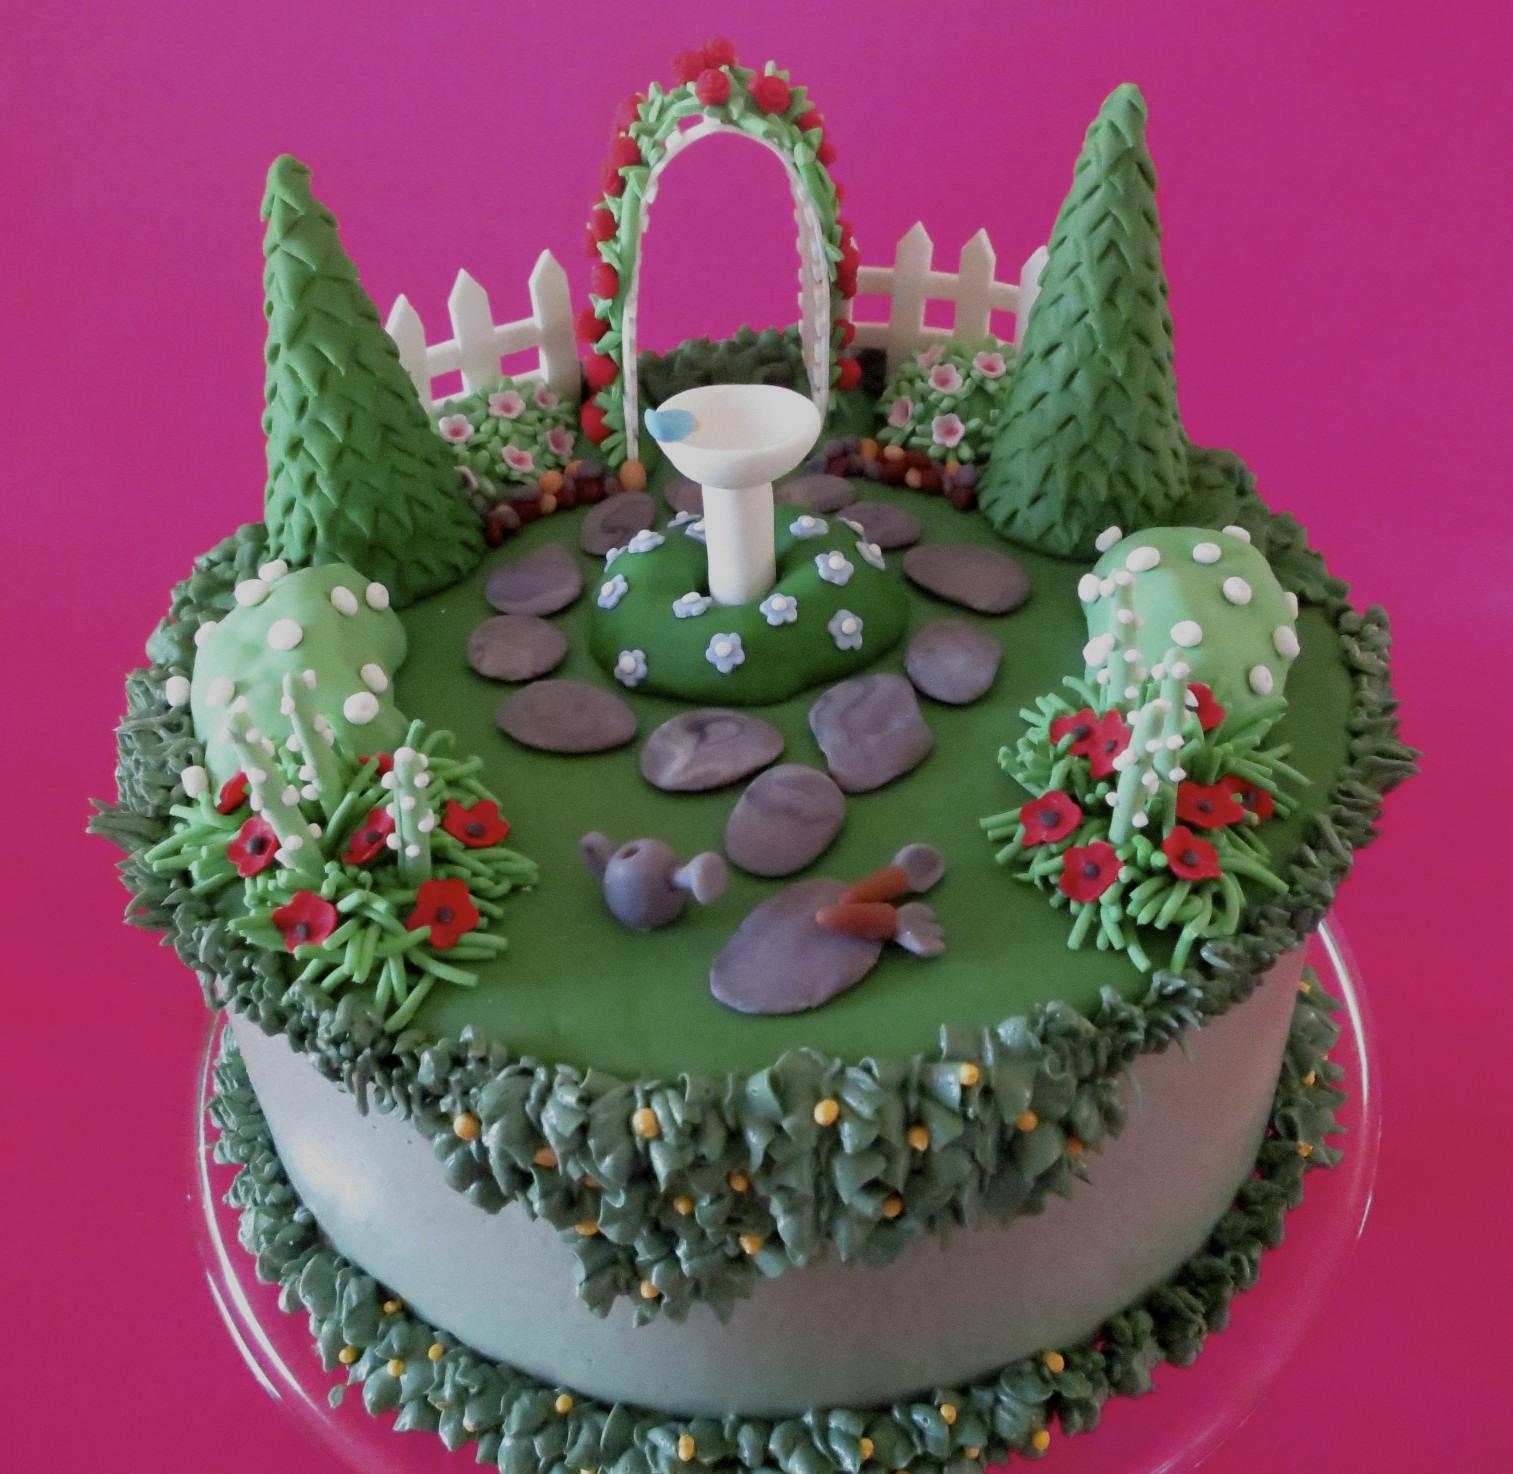 Spring Themed Cake Decorating Ideas